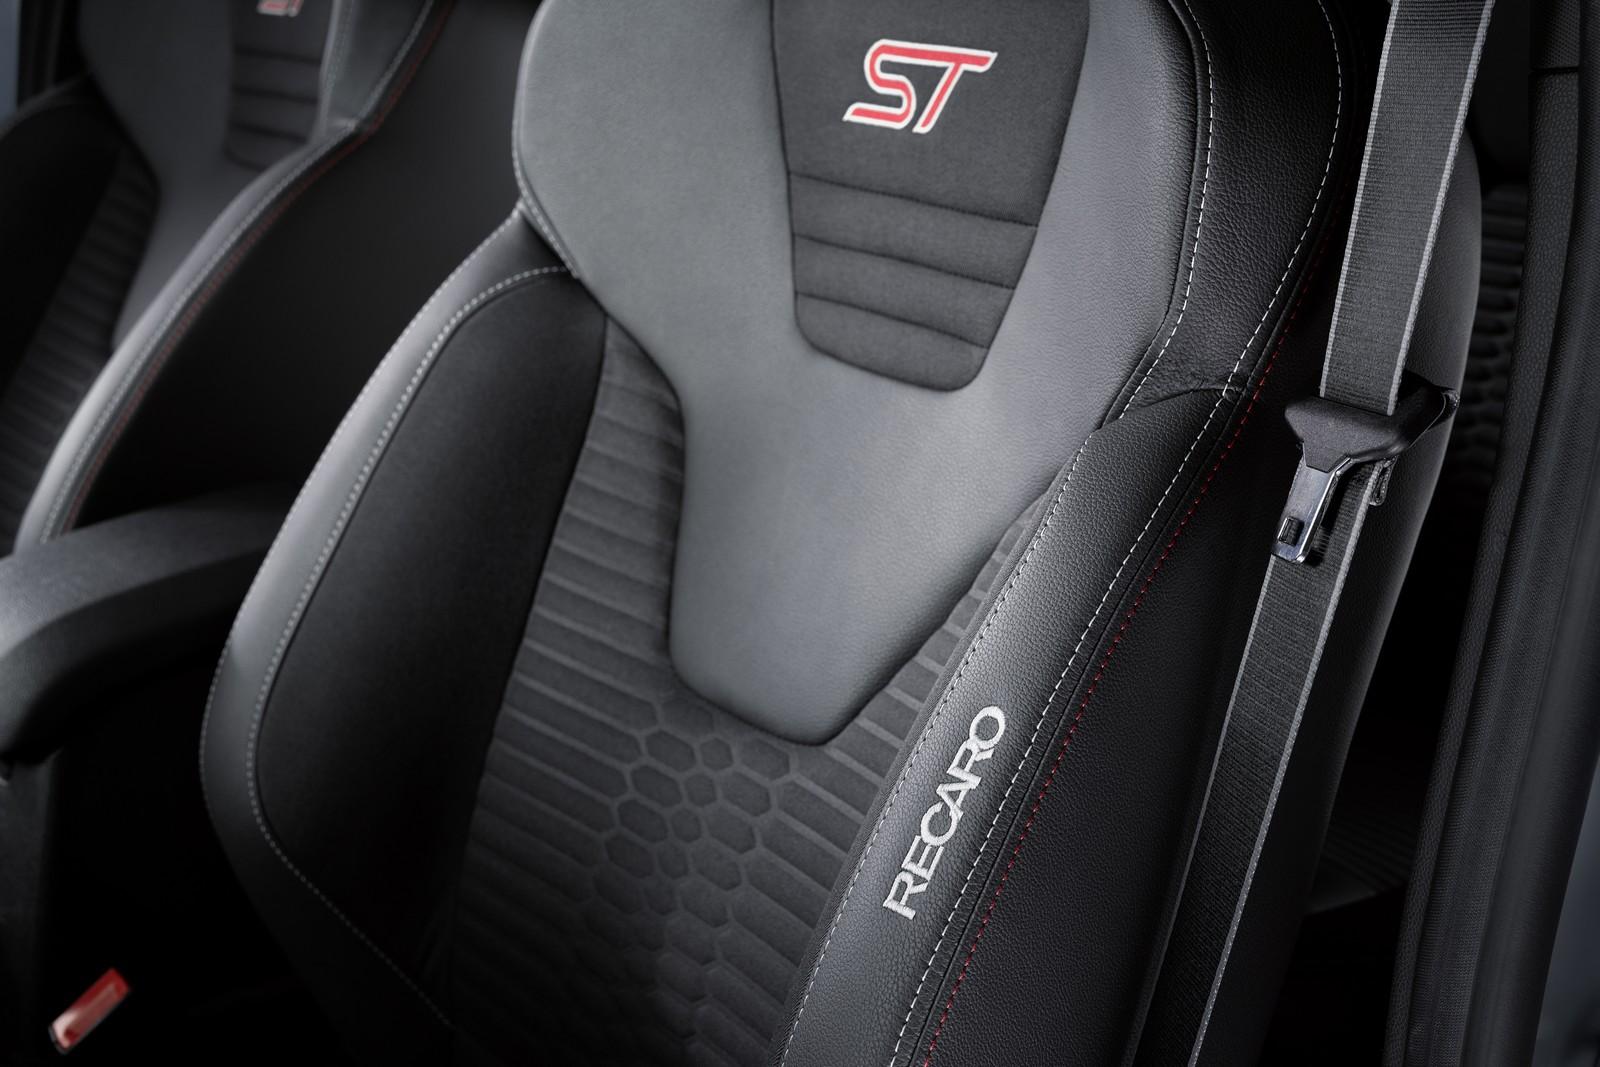 Ford Fiesta ST200 bucket seat press image